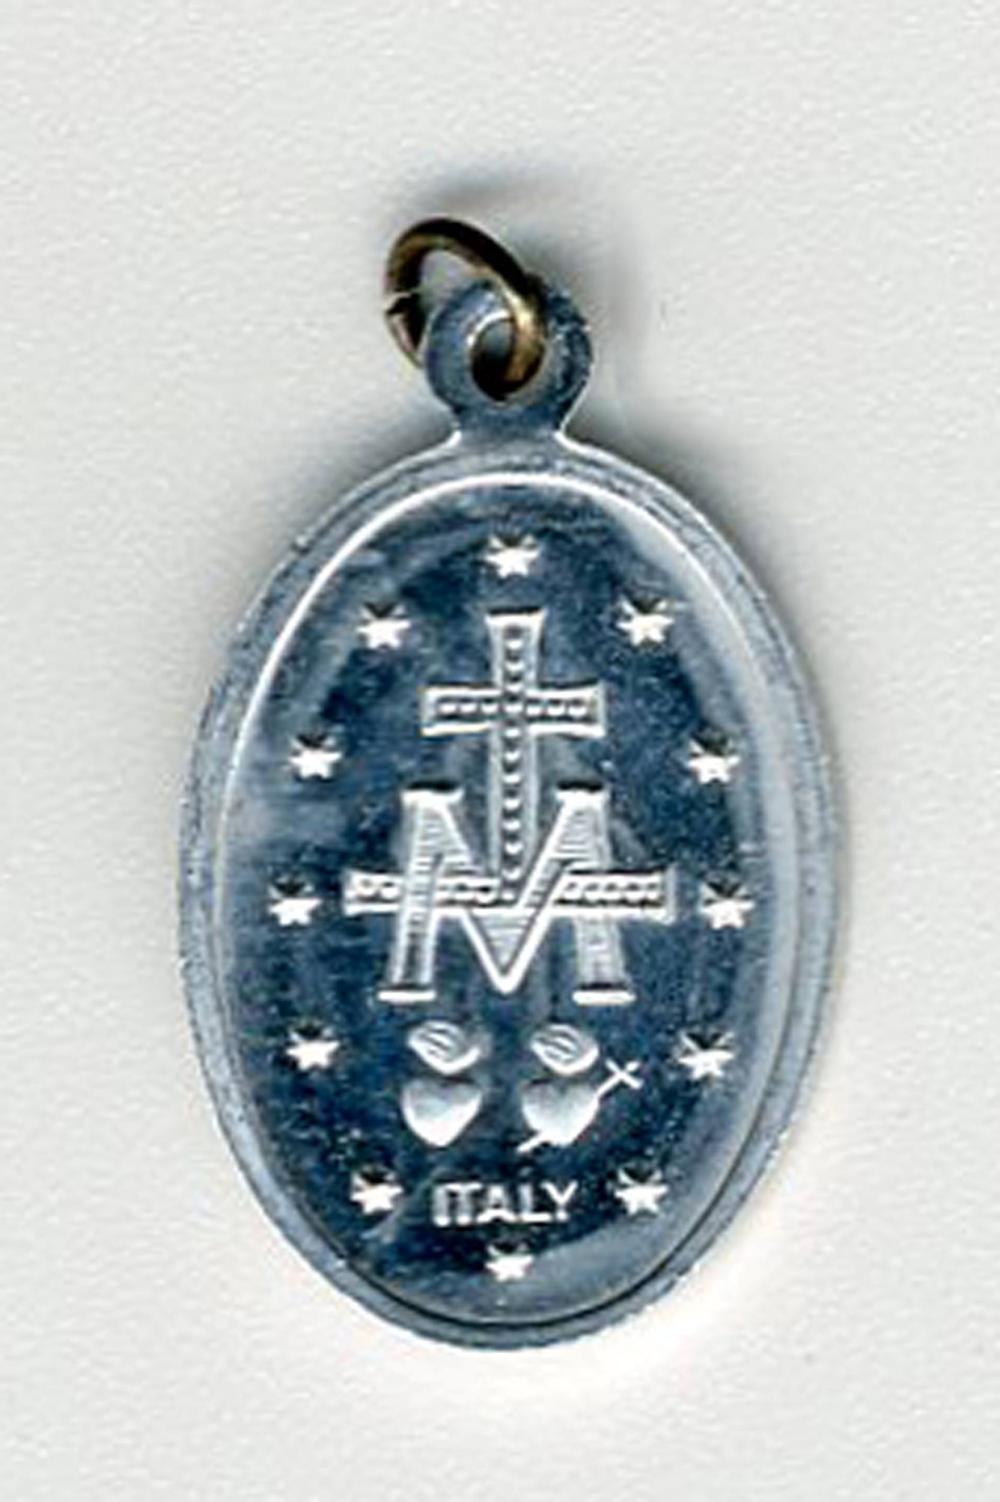 John F. Kennedy, Jr. Virgin Misericordia Religious Medal Received as Baby Gift